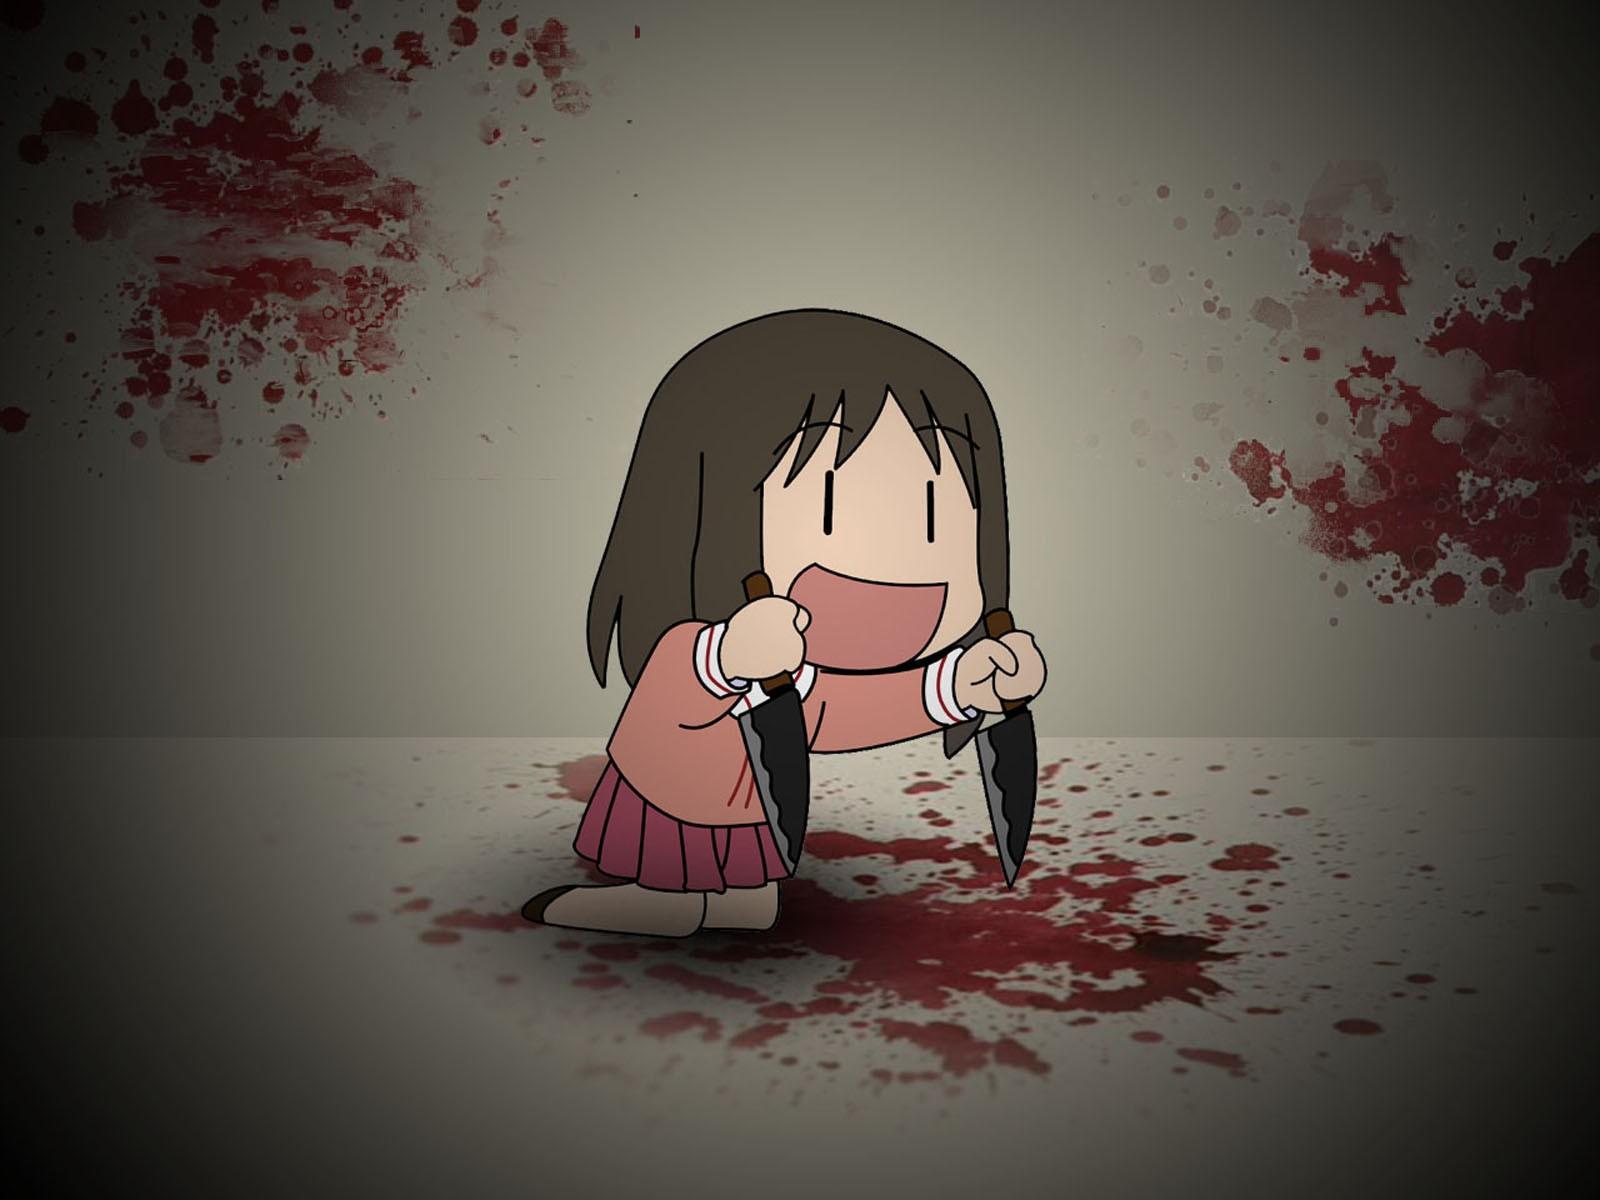 drawing illustration anime anime girls love red blood pink emotion knife Azumanga Daioh Kasuga Ayumu ART